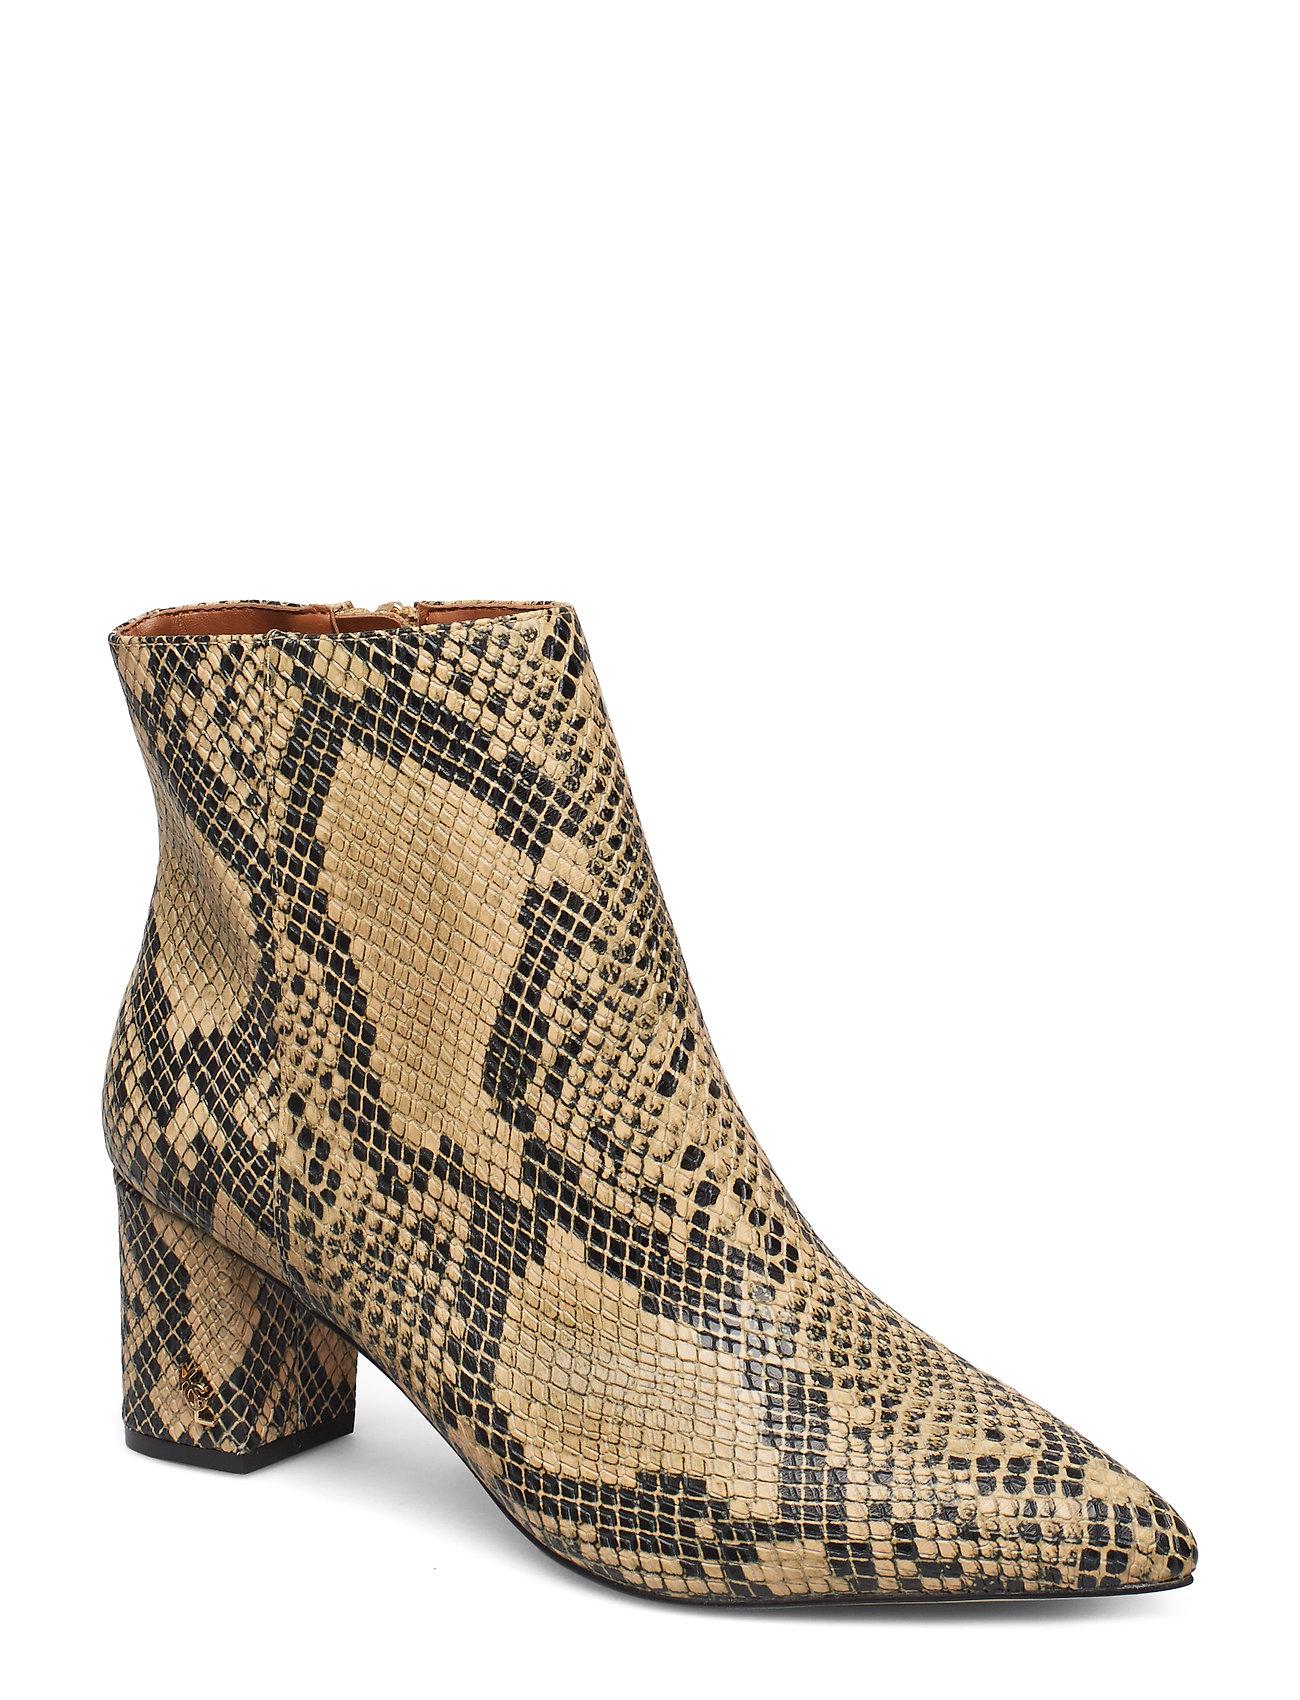 Image of Burlington Ankle Boot Shoes Boots Ankle Boots Ankle Boot - Heel Beige Kurt Geiger London (3406232729)